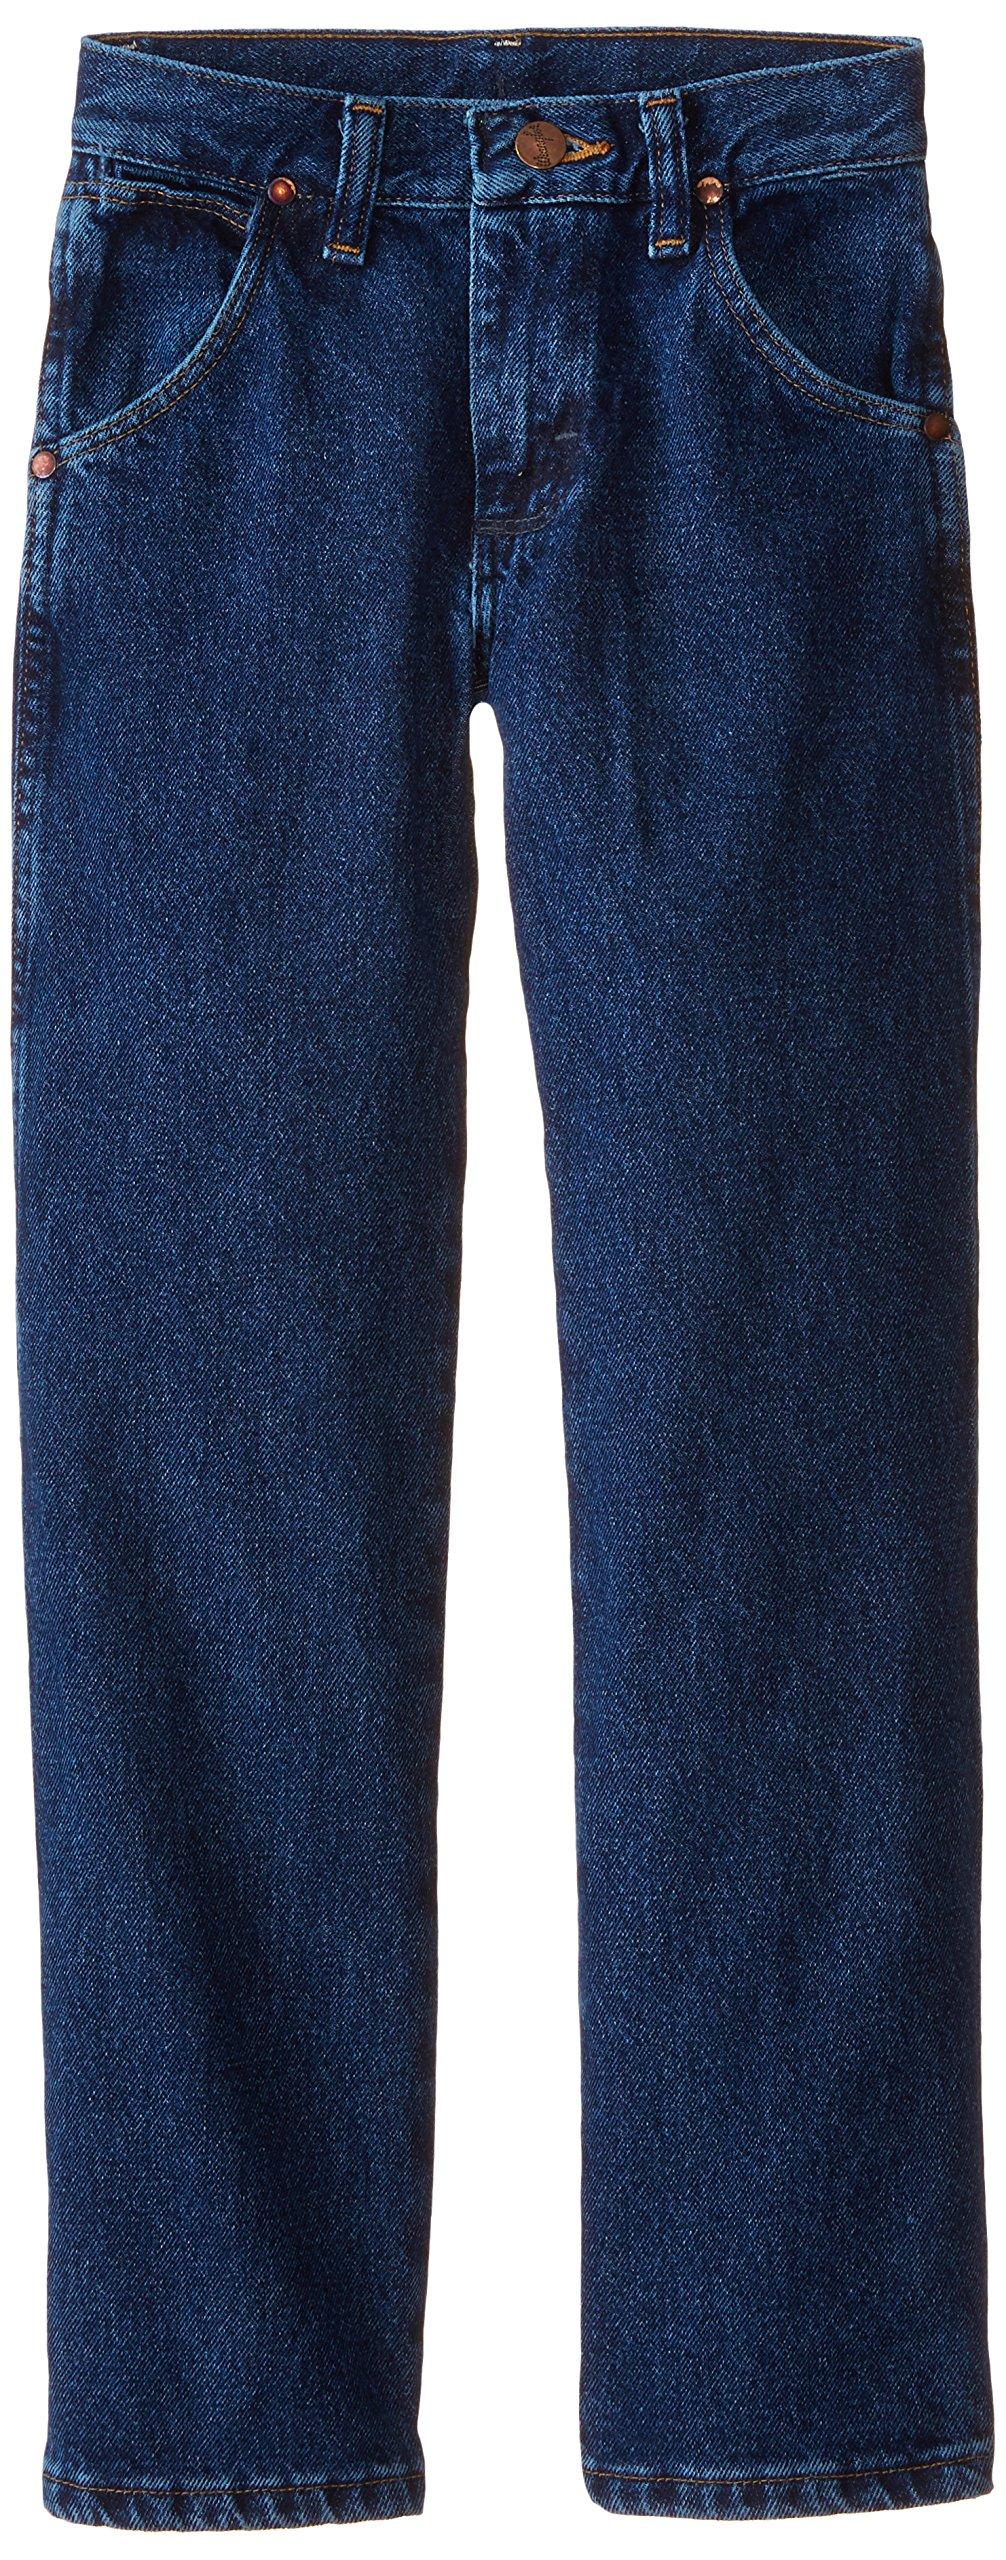 Wrangler Big Boys' Cowboy Cut Jeans,Dark Indigo,8 Slim